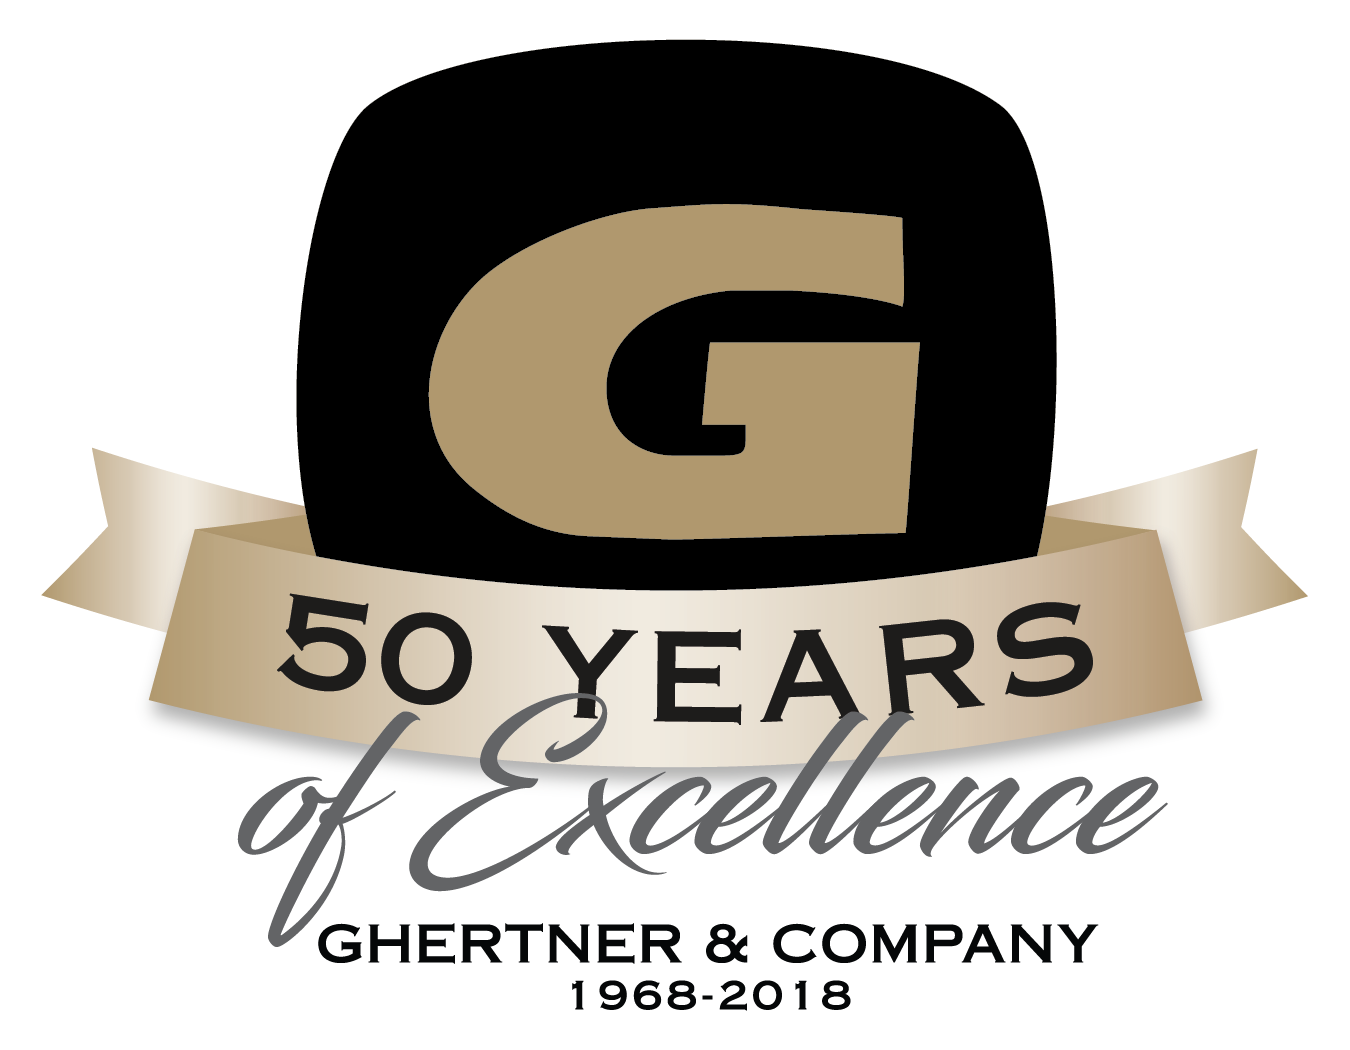 Otter Wood Community Celebrates 30th Anniversary Ghertner Company